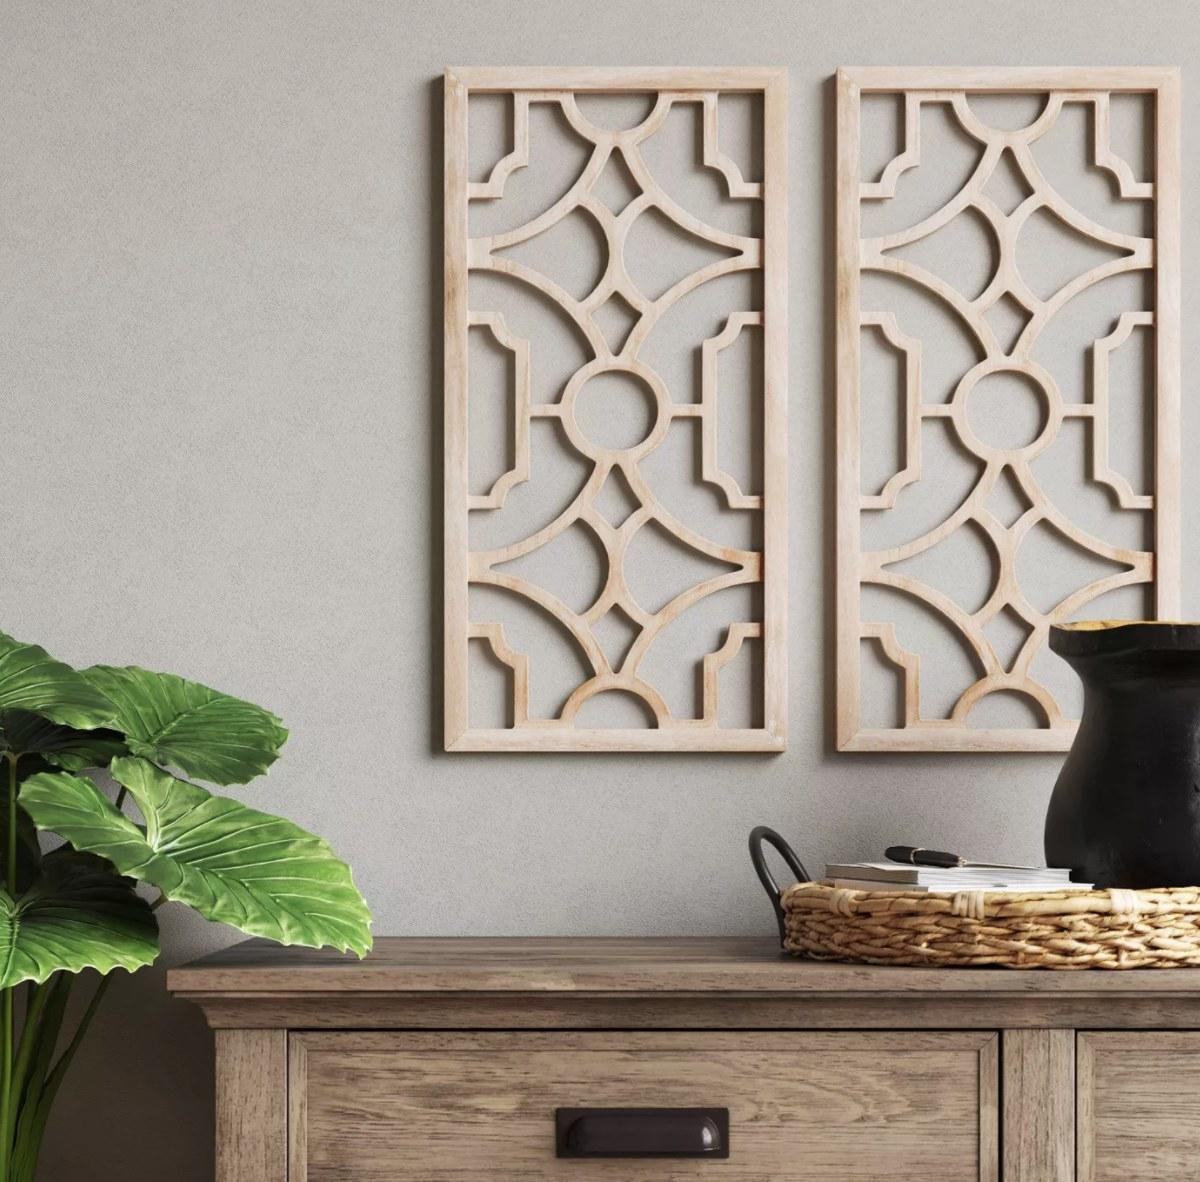 A pair of wood lattice wall hangings